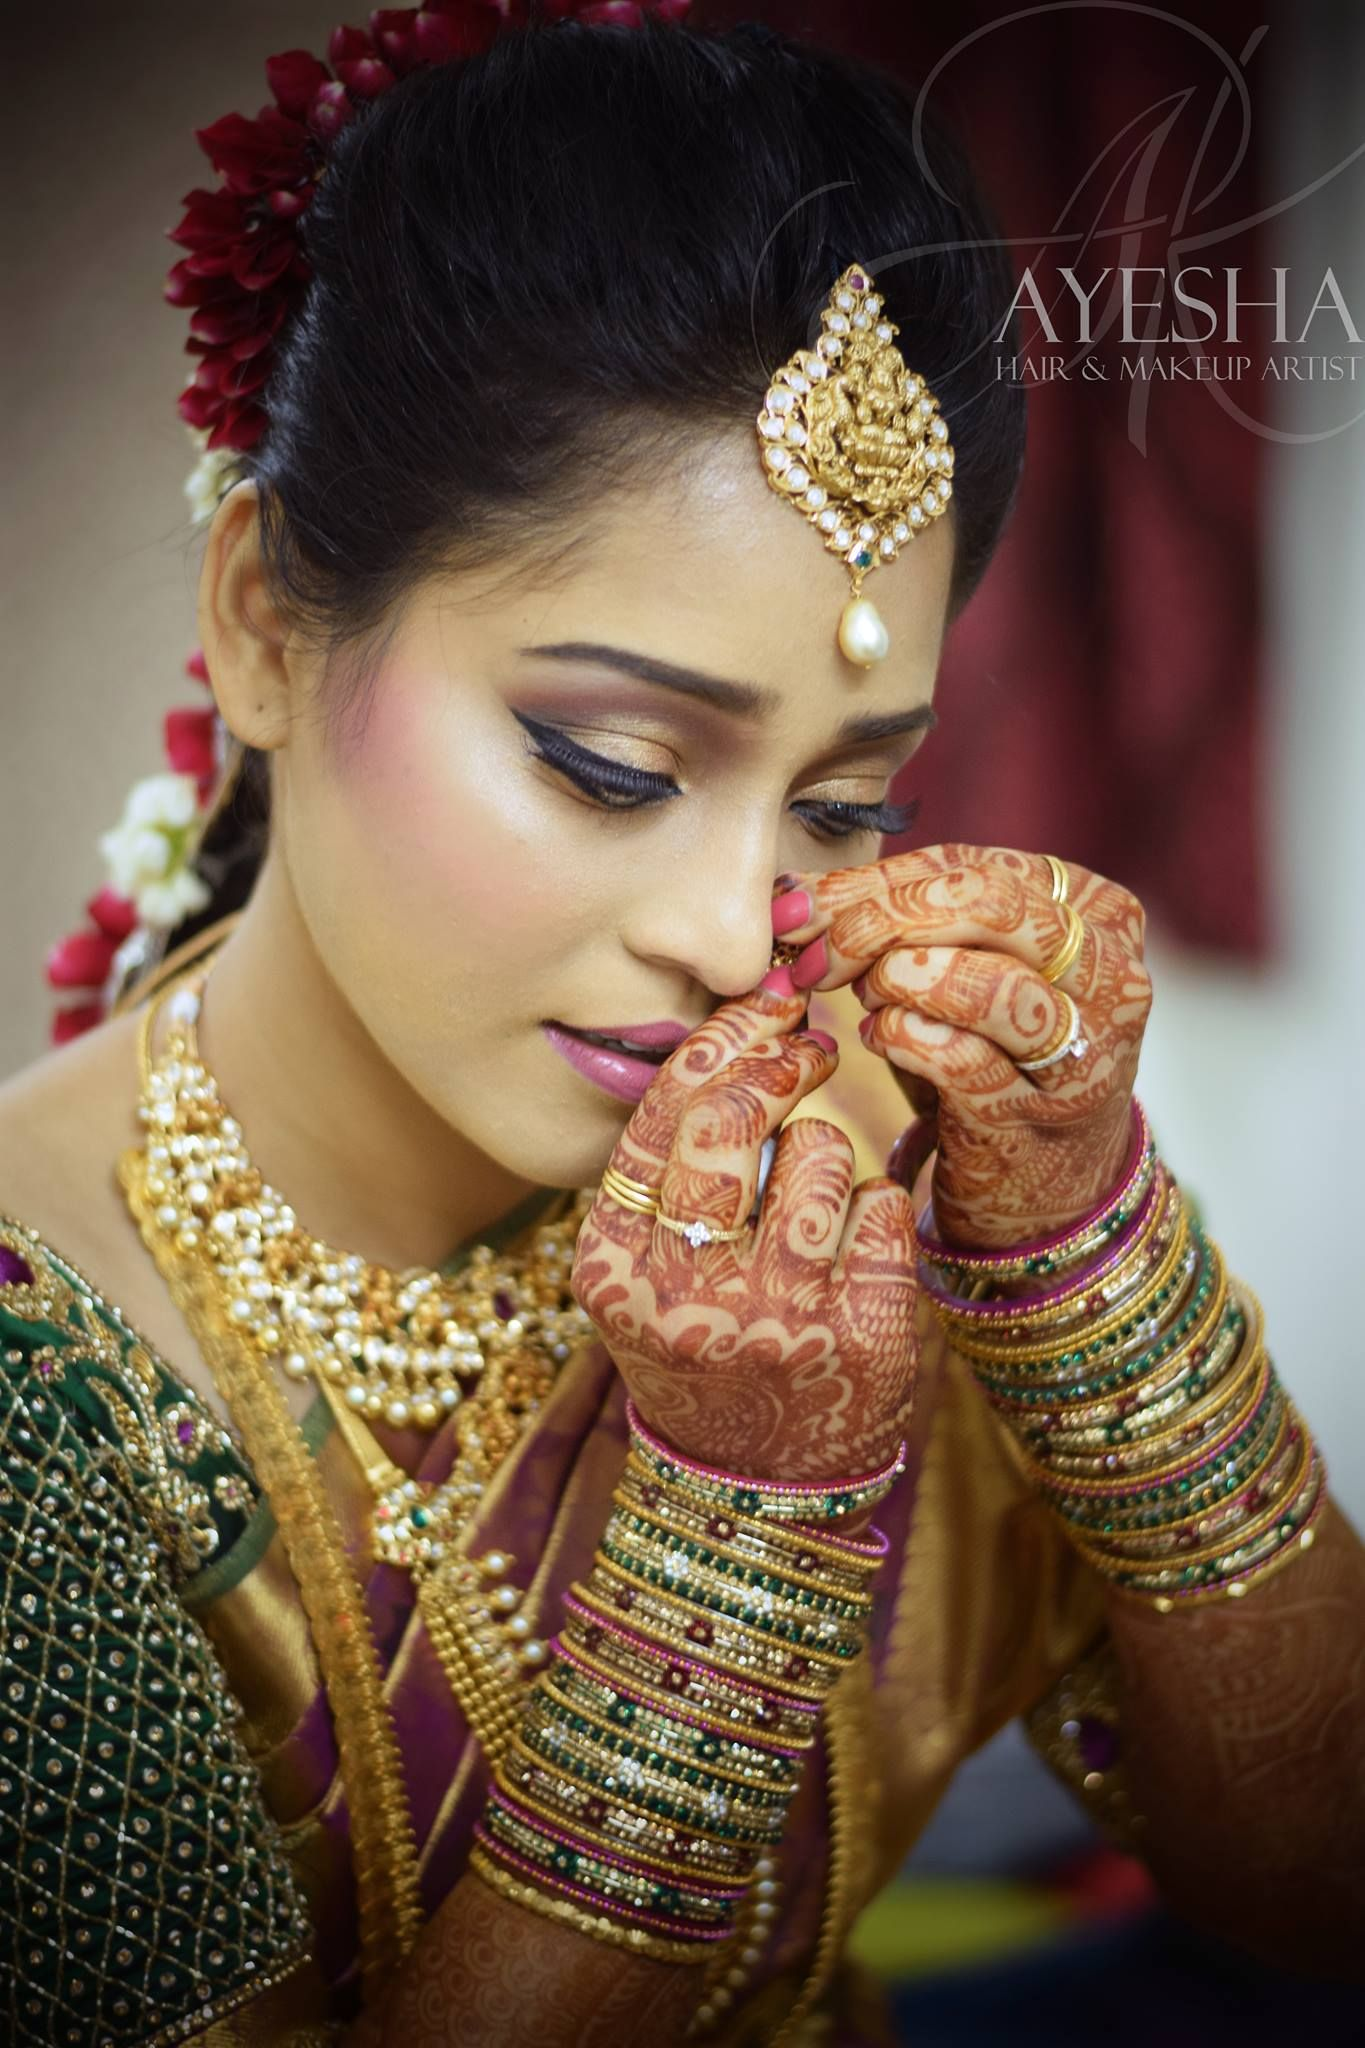 Wedding Day South Indian Wedding Makeup by Ayesha AK southindian